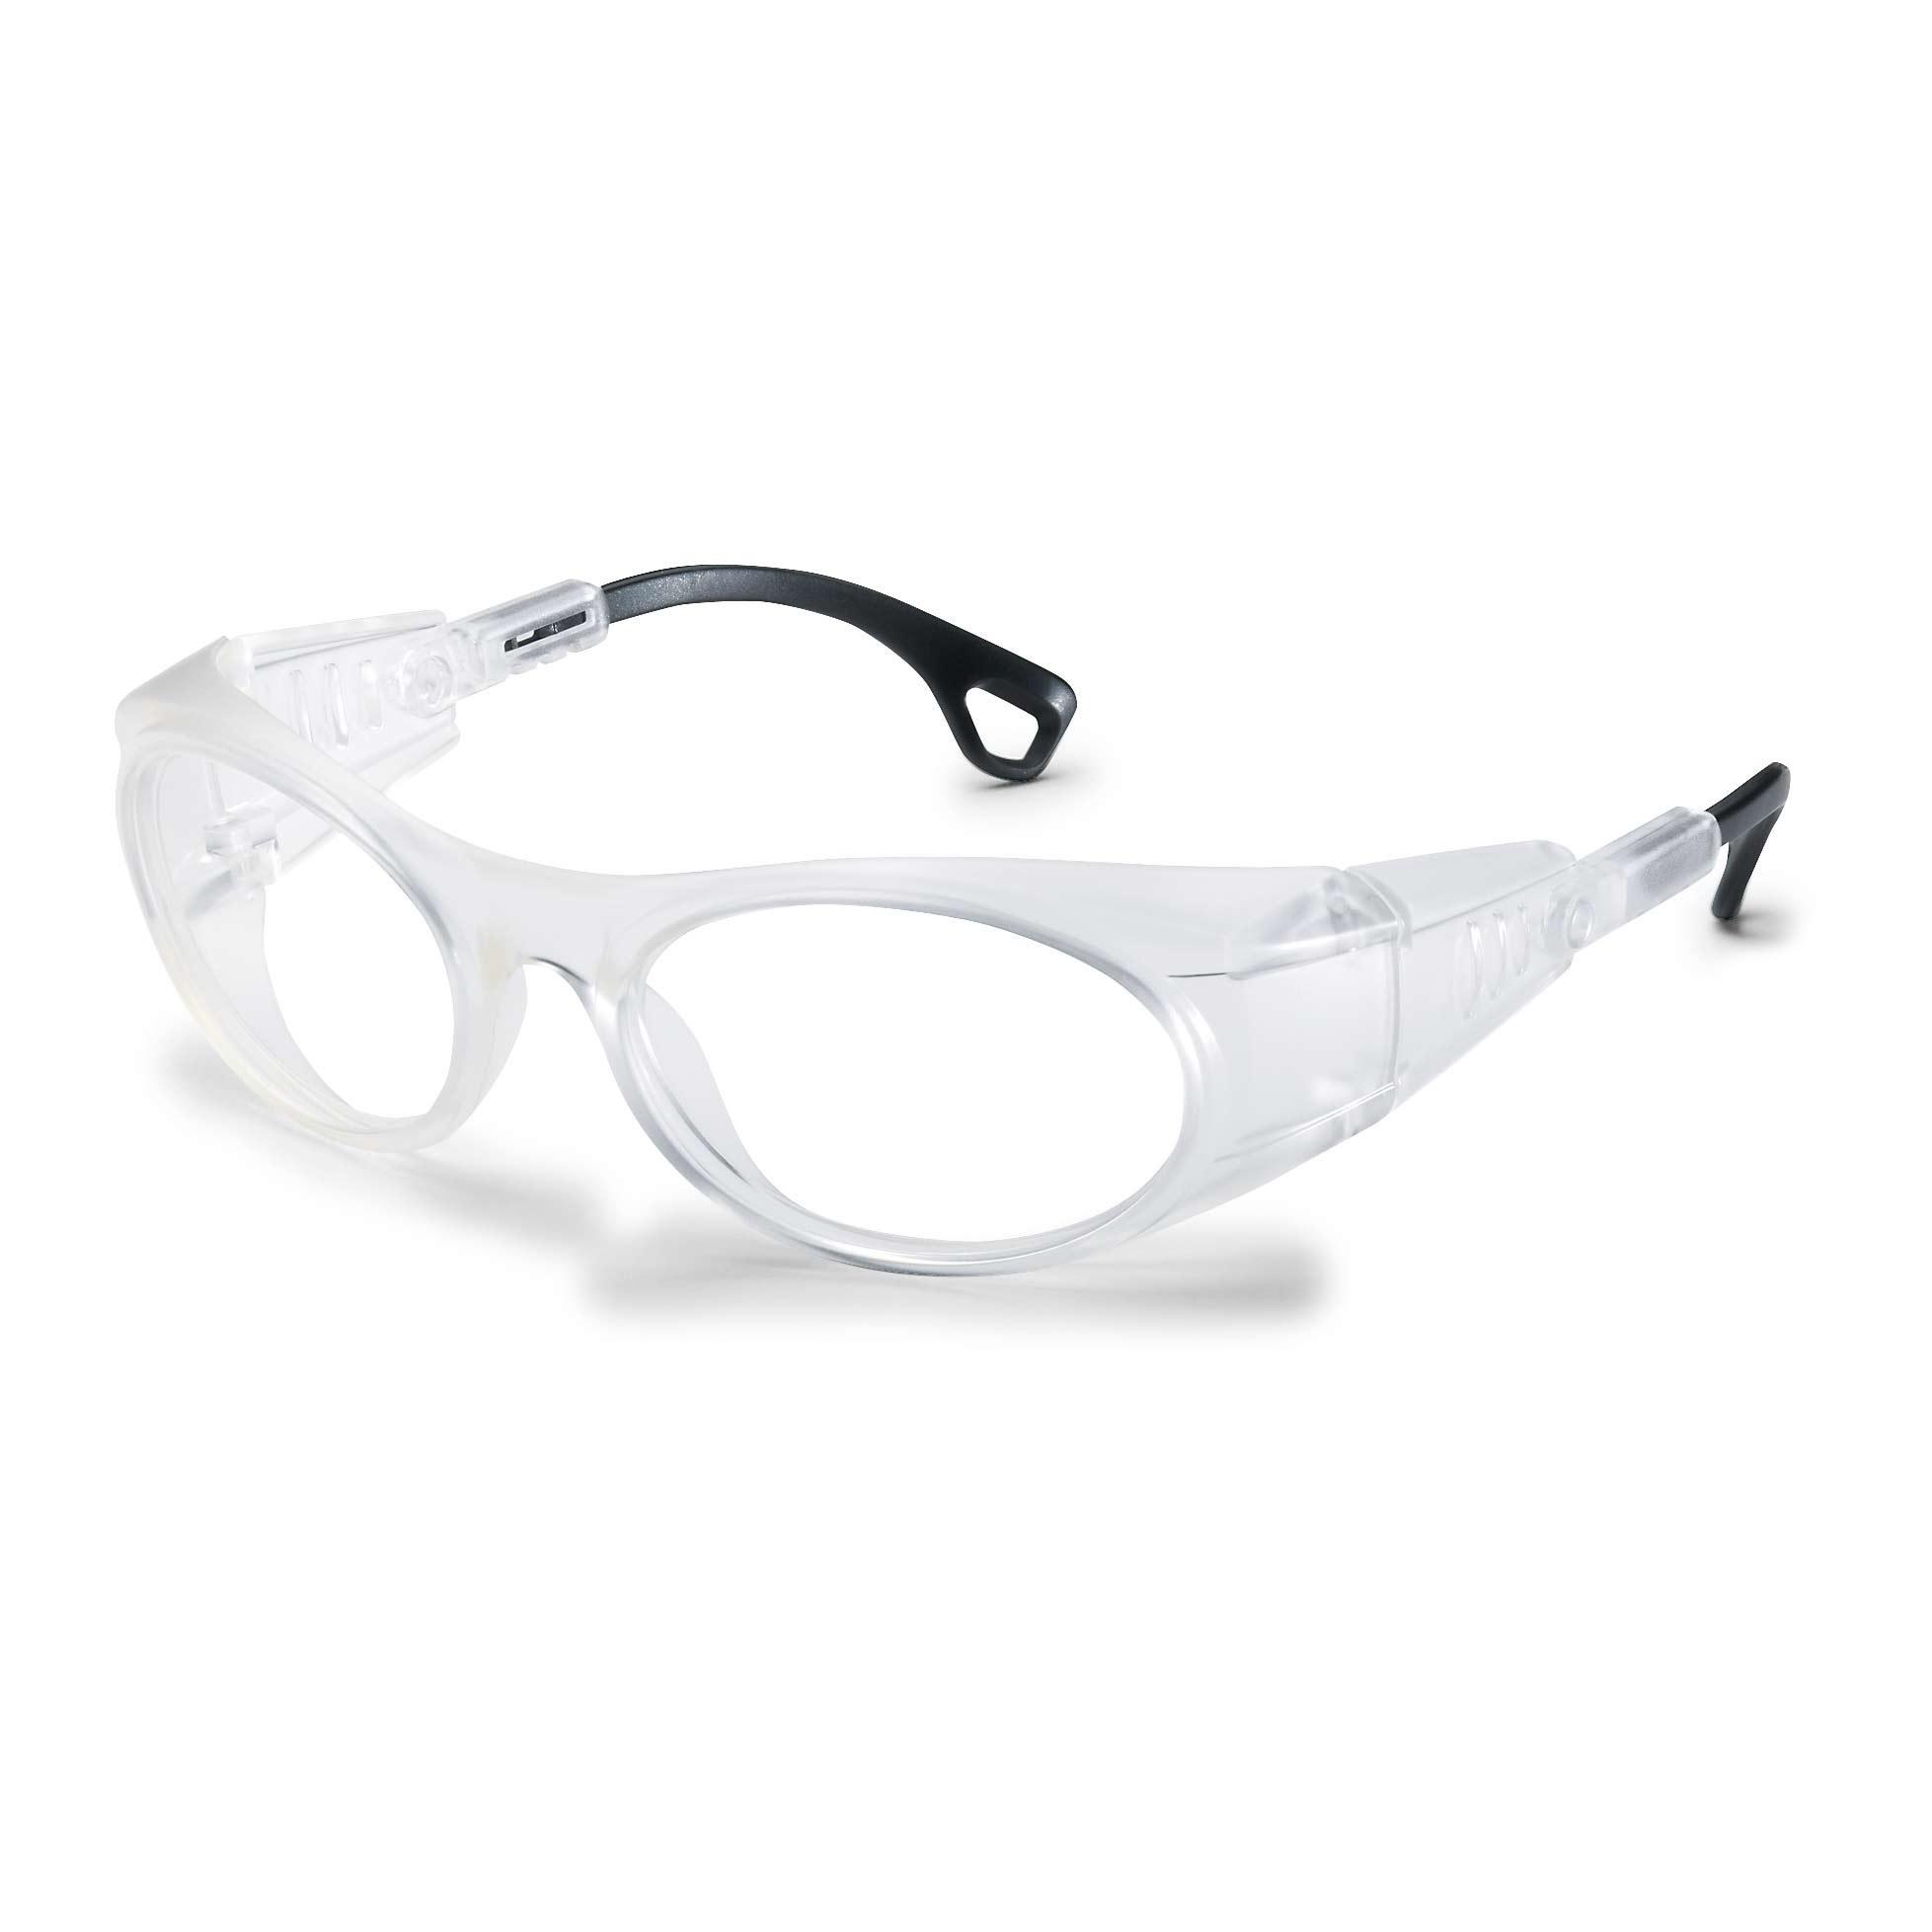 7570d693ddd Uvex Prescription Glasses - Bitterroot Public Library